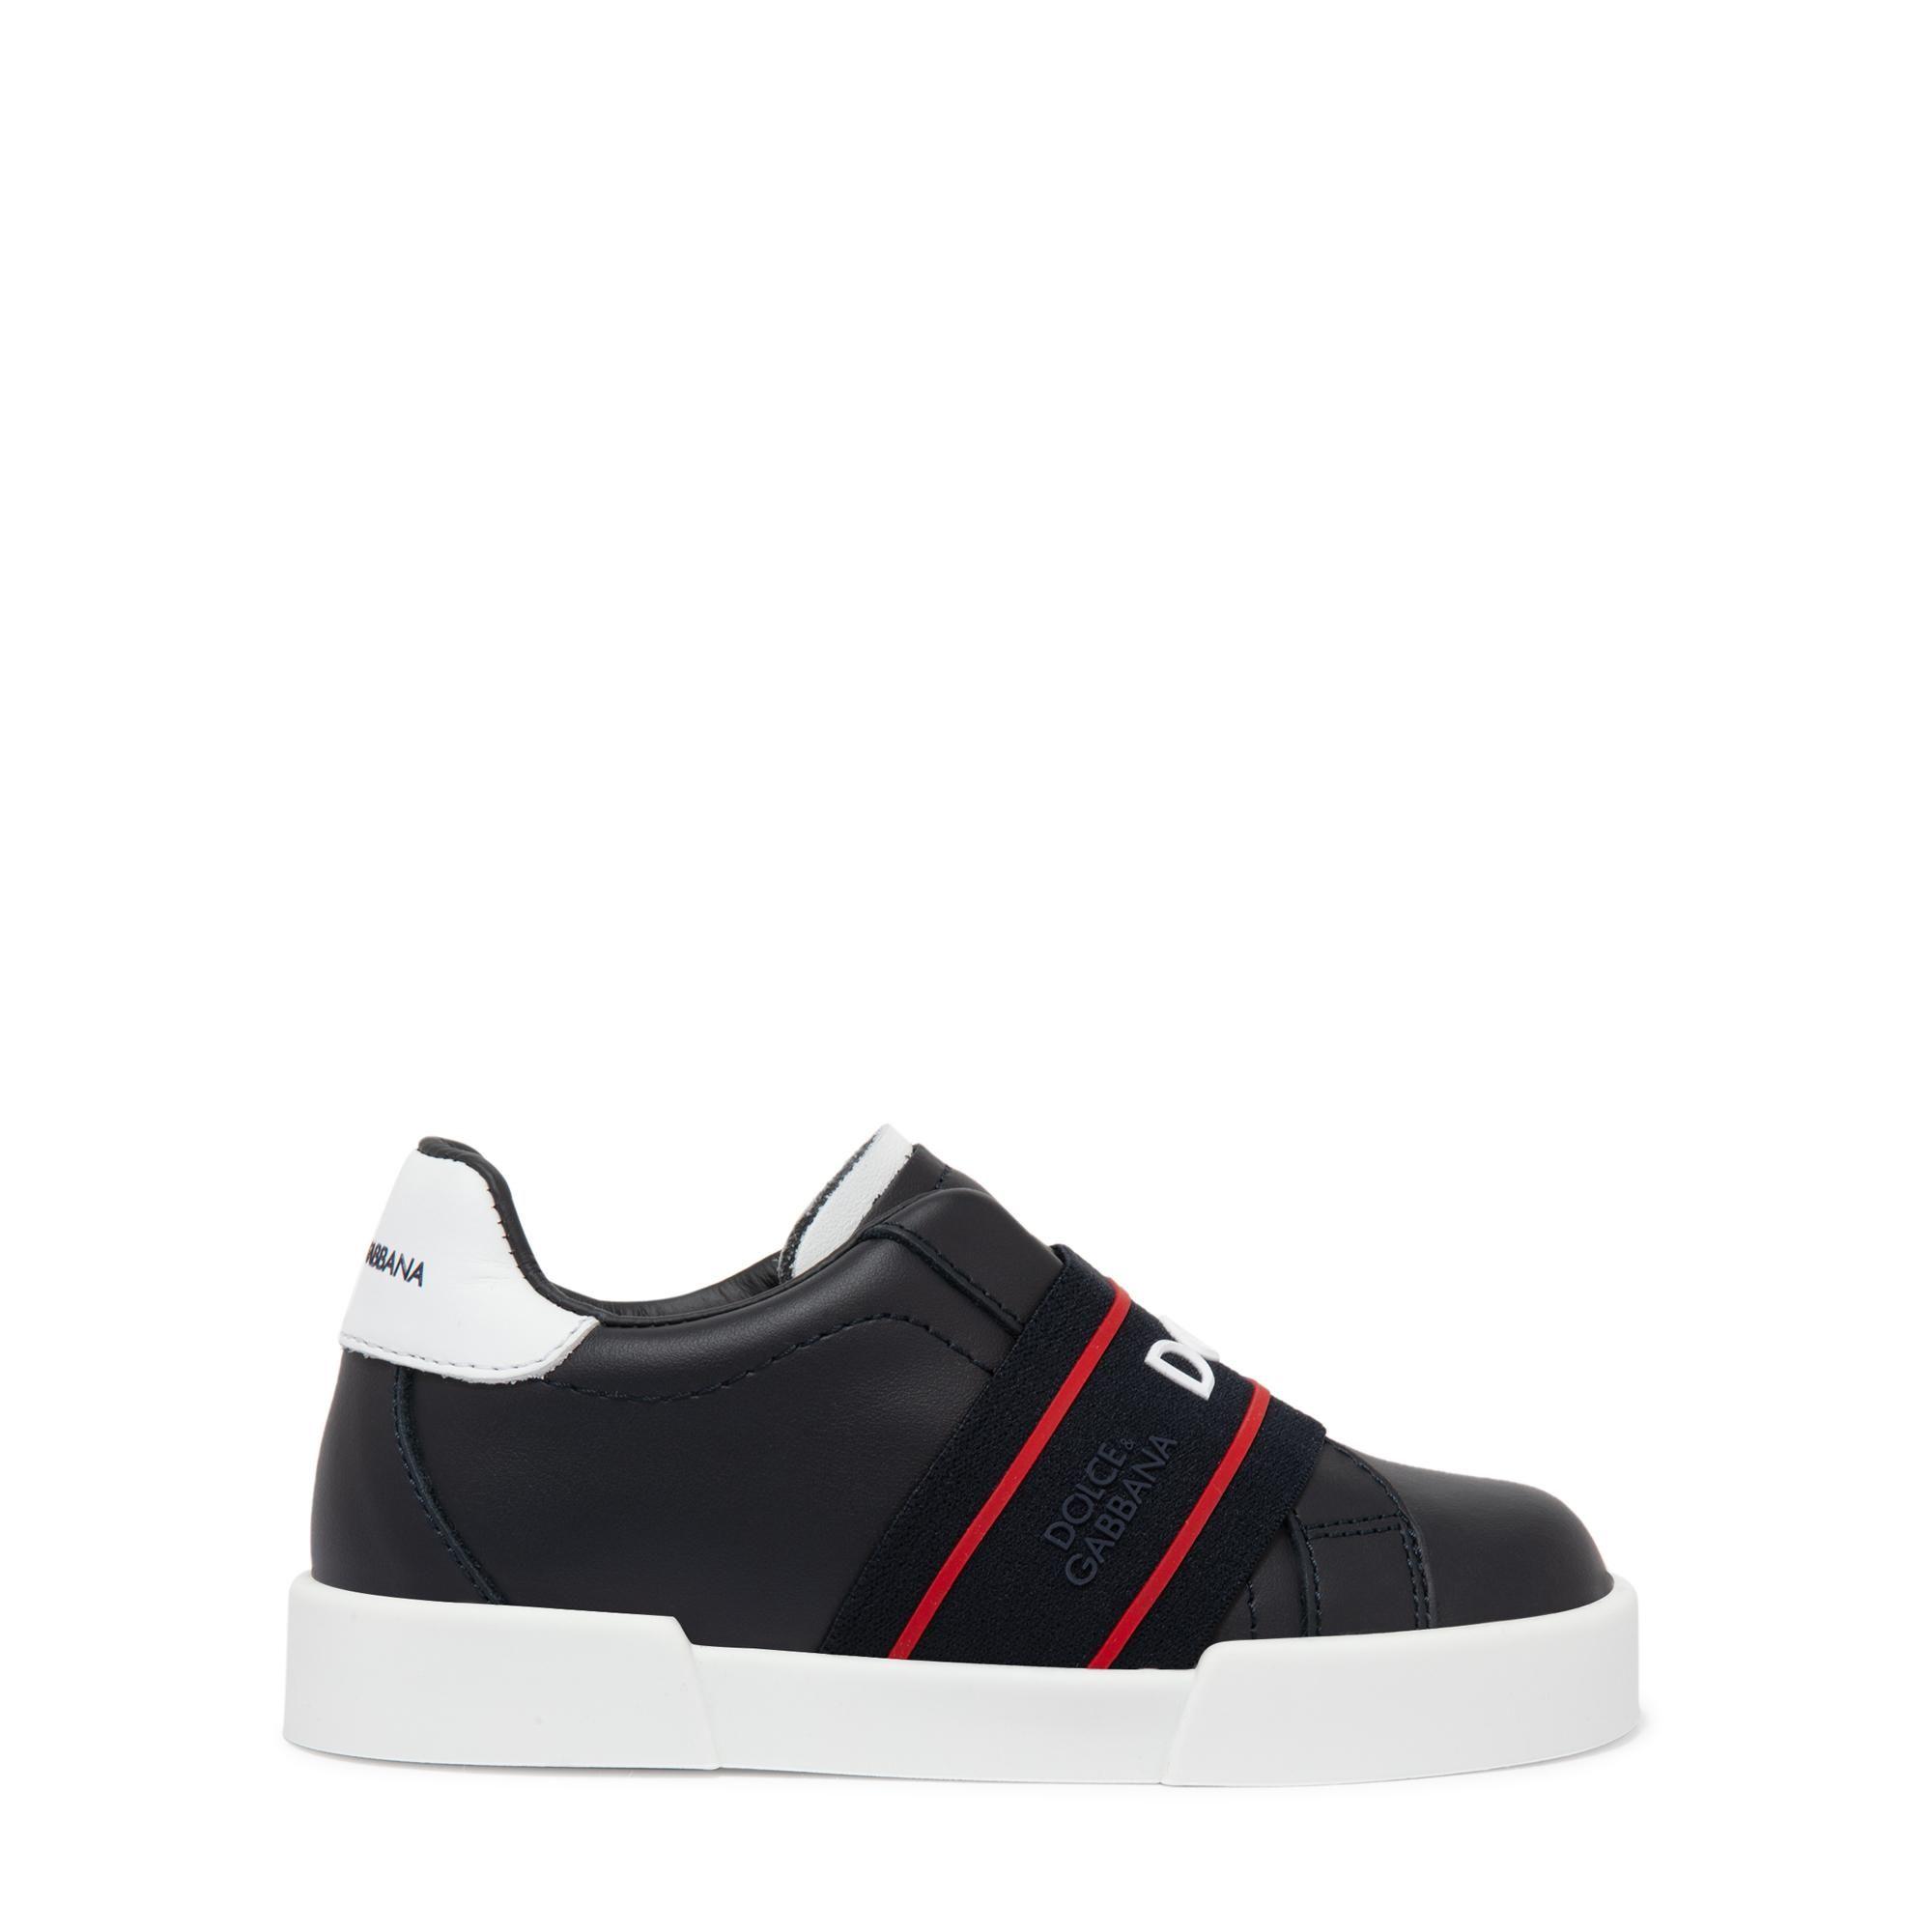 Portofino light sneakers